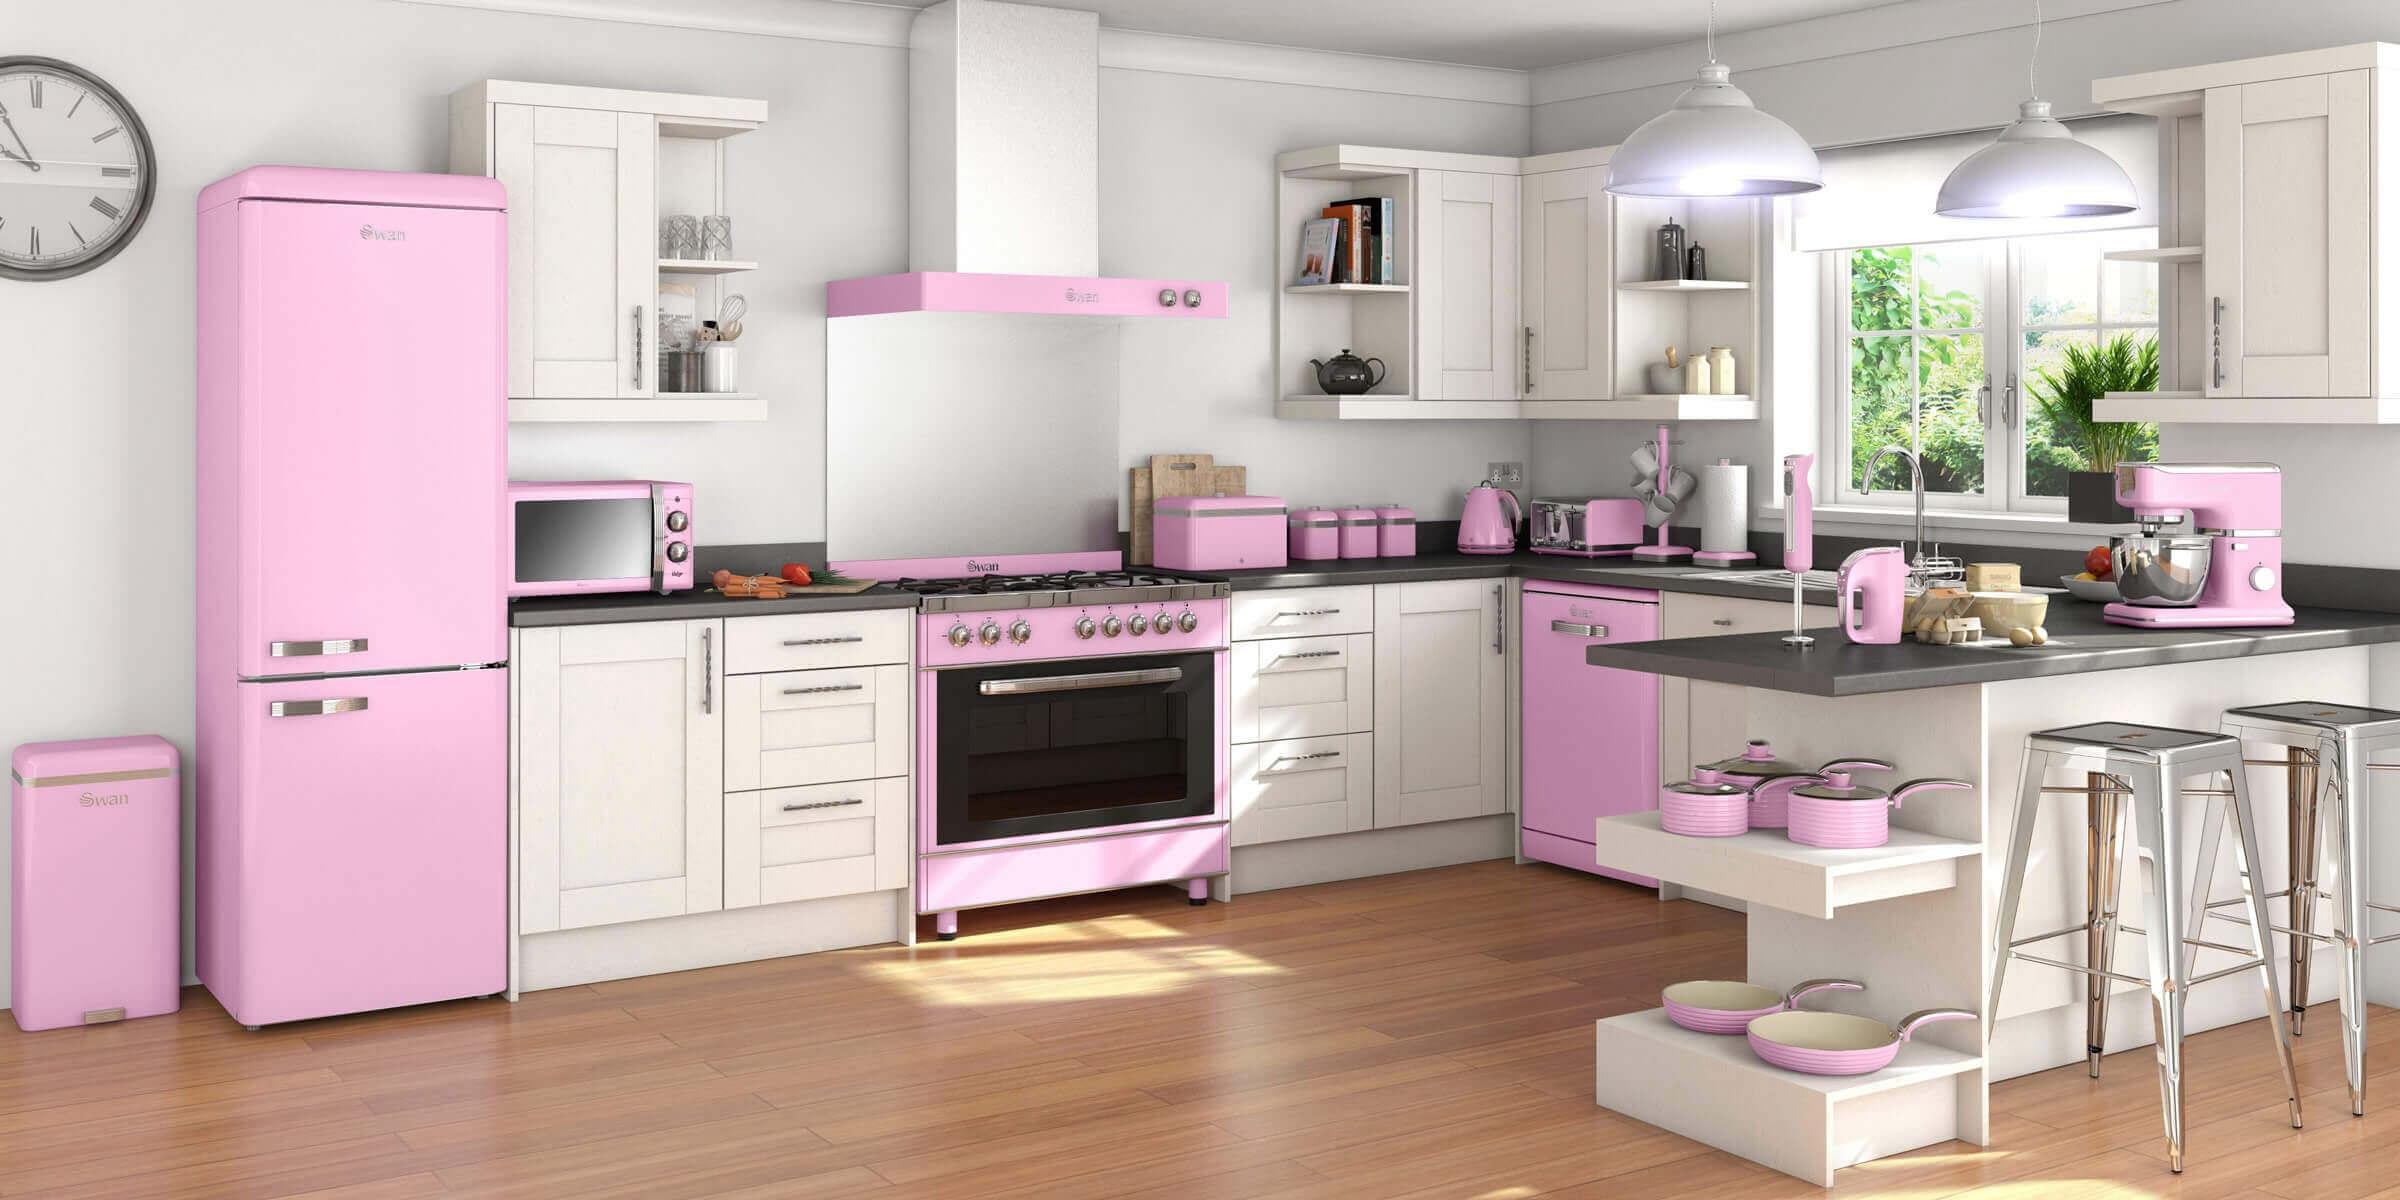 cream kitchen cabinet ideas hanging lighting fixtures for swan | fearne mixers & blenders retro appliances ao.com